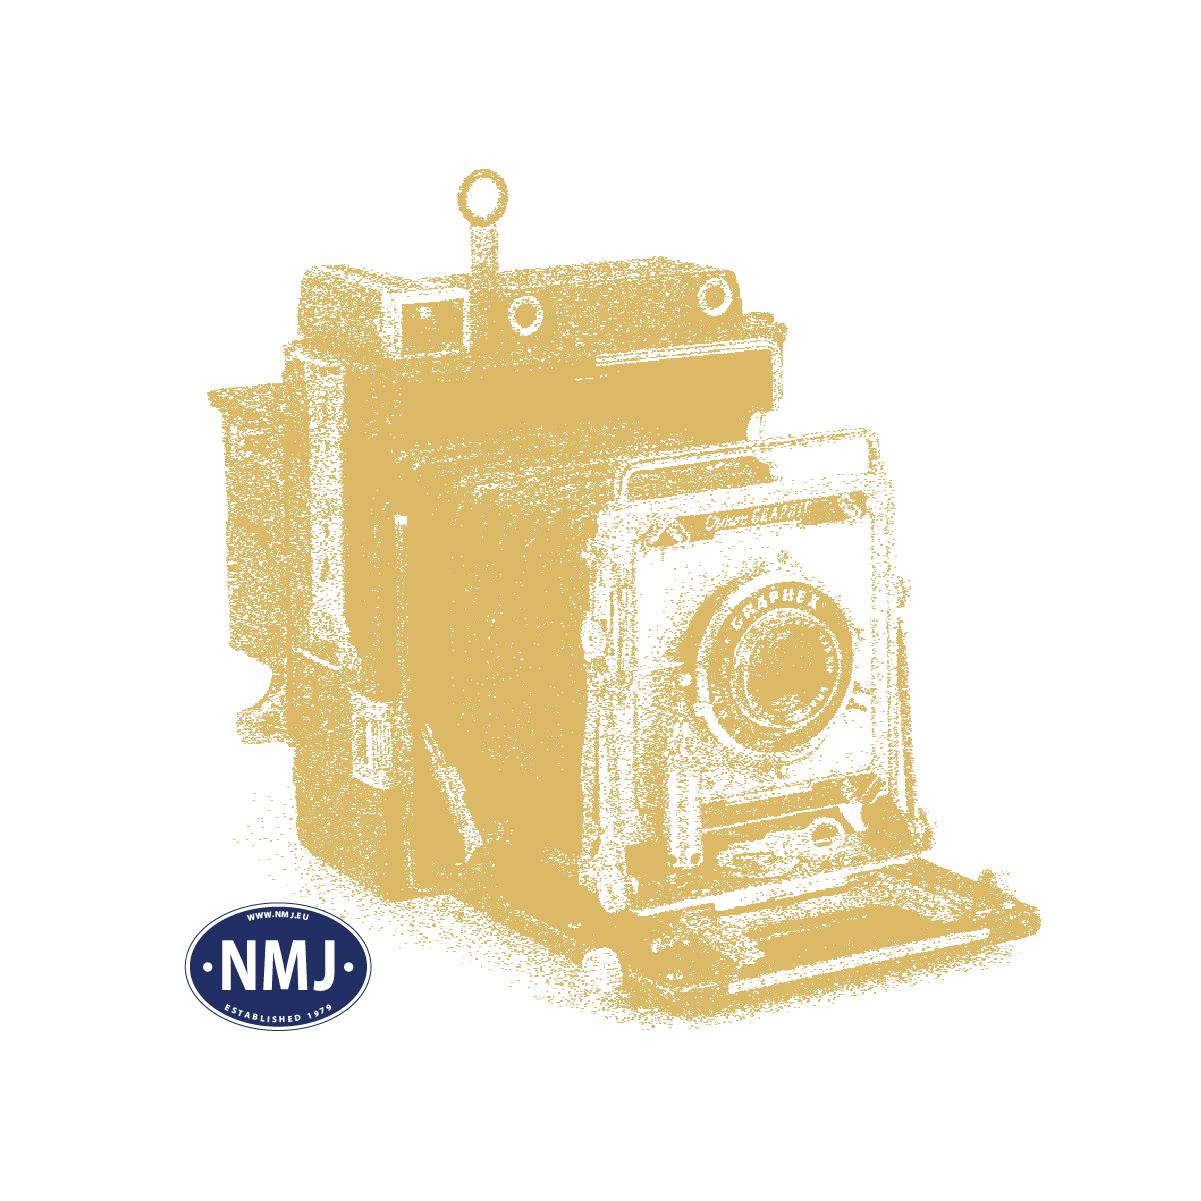 NMJT95102 - NMJ Topline DSB MY 1112, AC m/ Sound